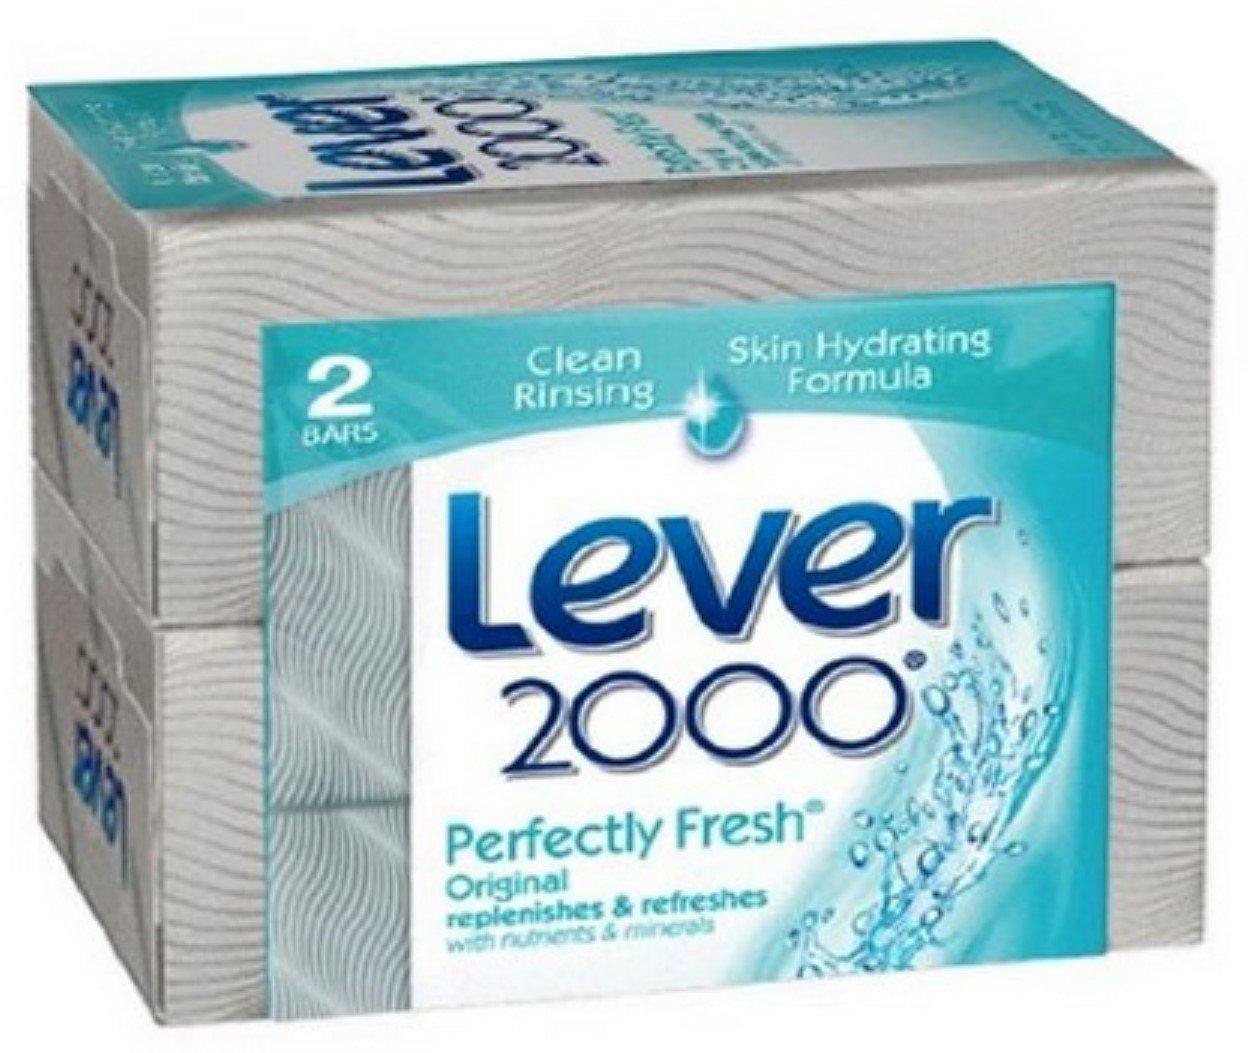 Lever 2000 Original Refreshing Bar Soap, 4.5 oz bars, 2 ea (Pack of 5)